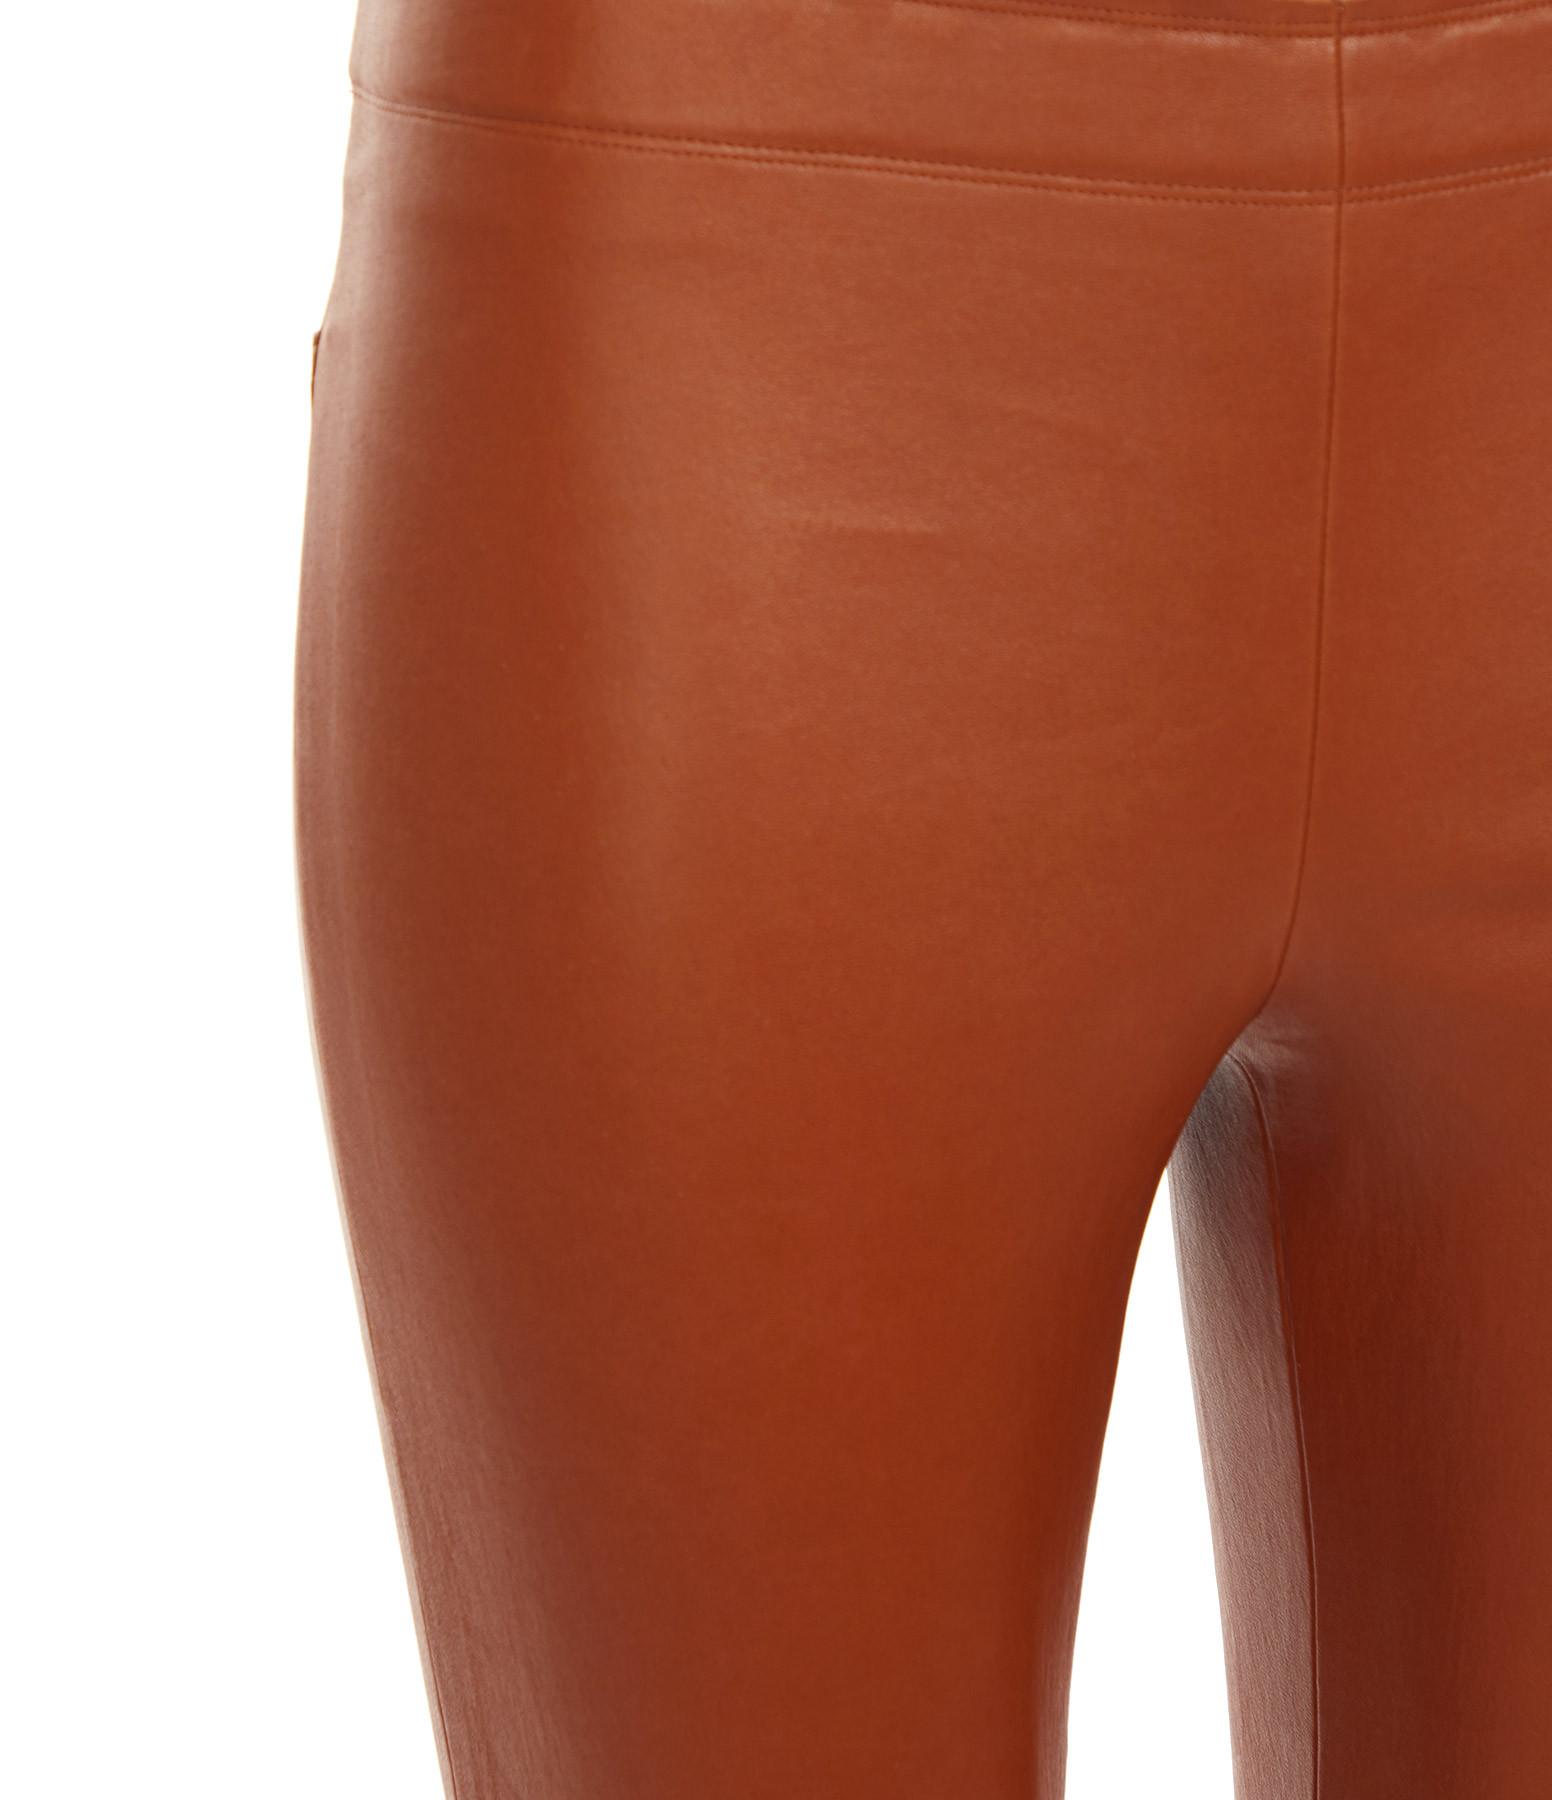 STOULS - Pantalon JP Twenty Agneau Plongé Light Chesterfield